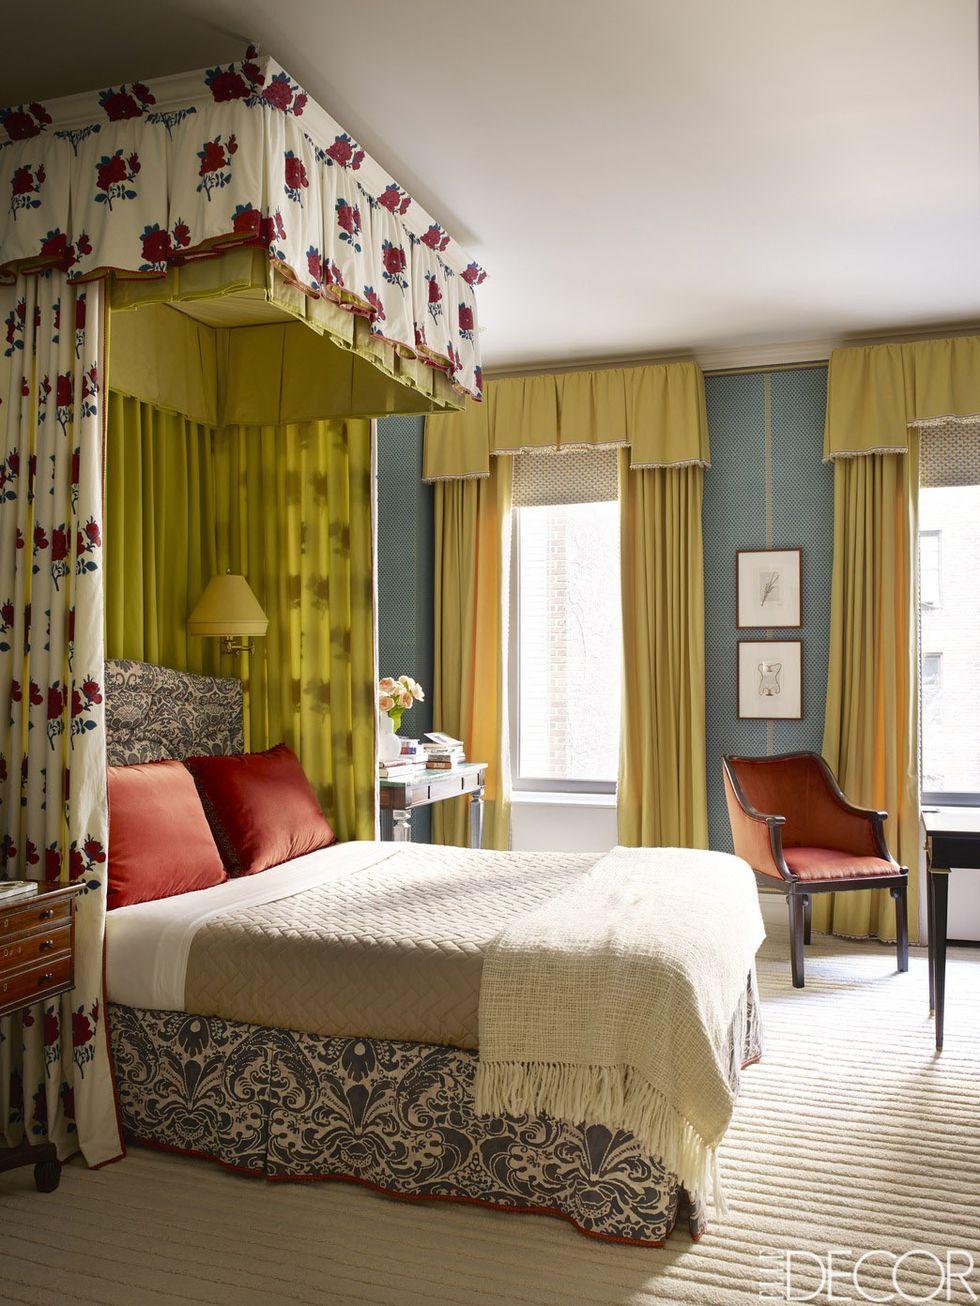 Best Bedroom Curtains - Ideas for Bedroom Window Treatments on Master Bedroom Curtain Ideas  id=65234